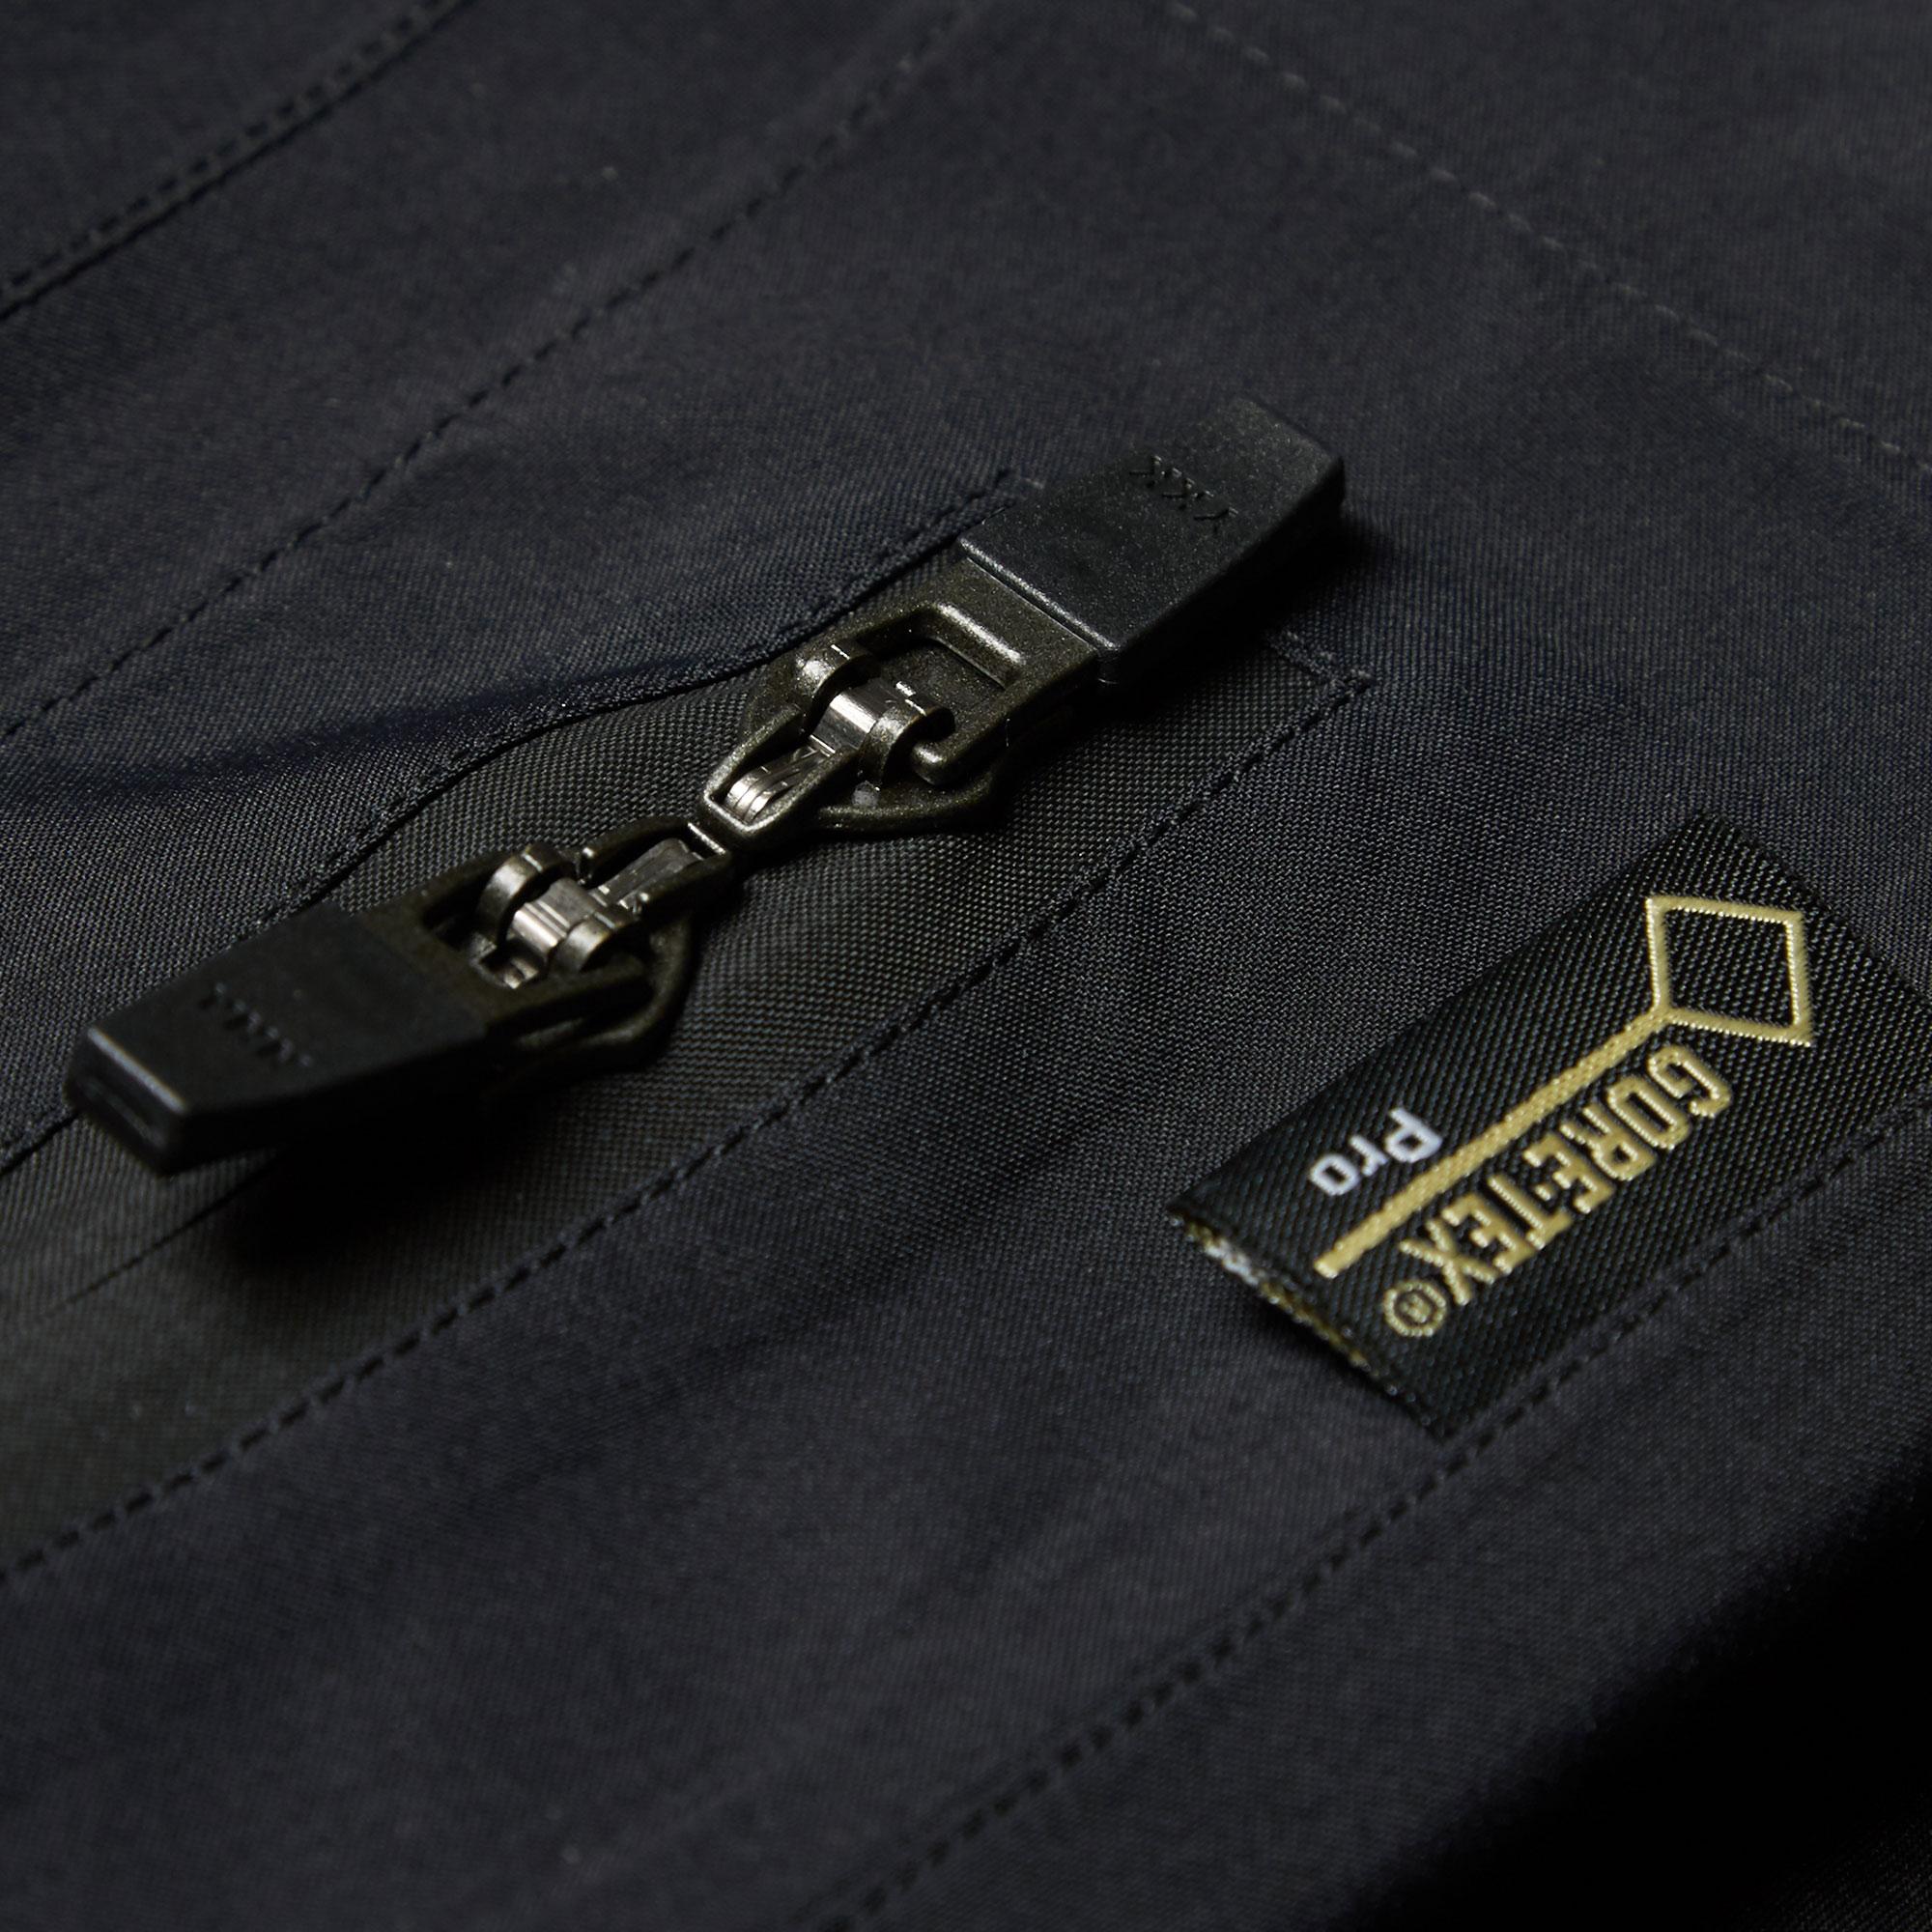 ACRONYM用於外套上的Gore-Tex材質稱為「PacLite」,具有高度的防水功能,鮮少獨立設計師品牌能夠獲准使用這種布料。